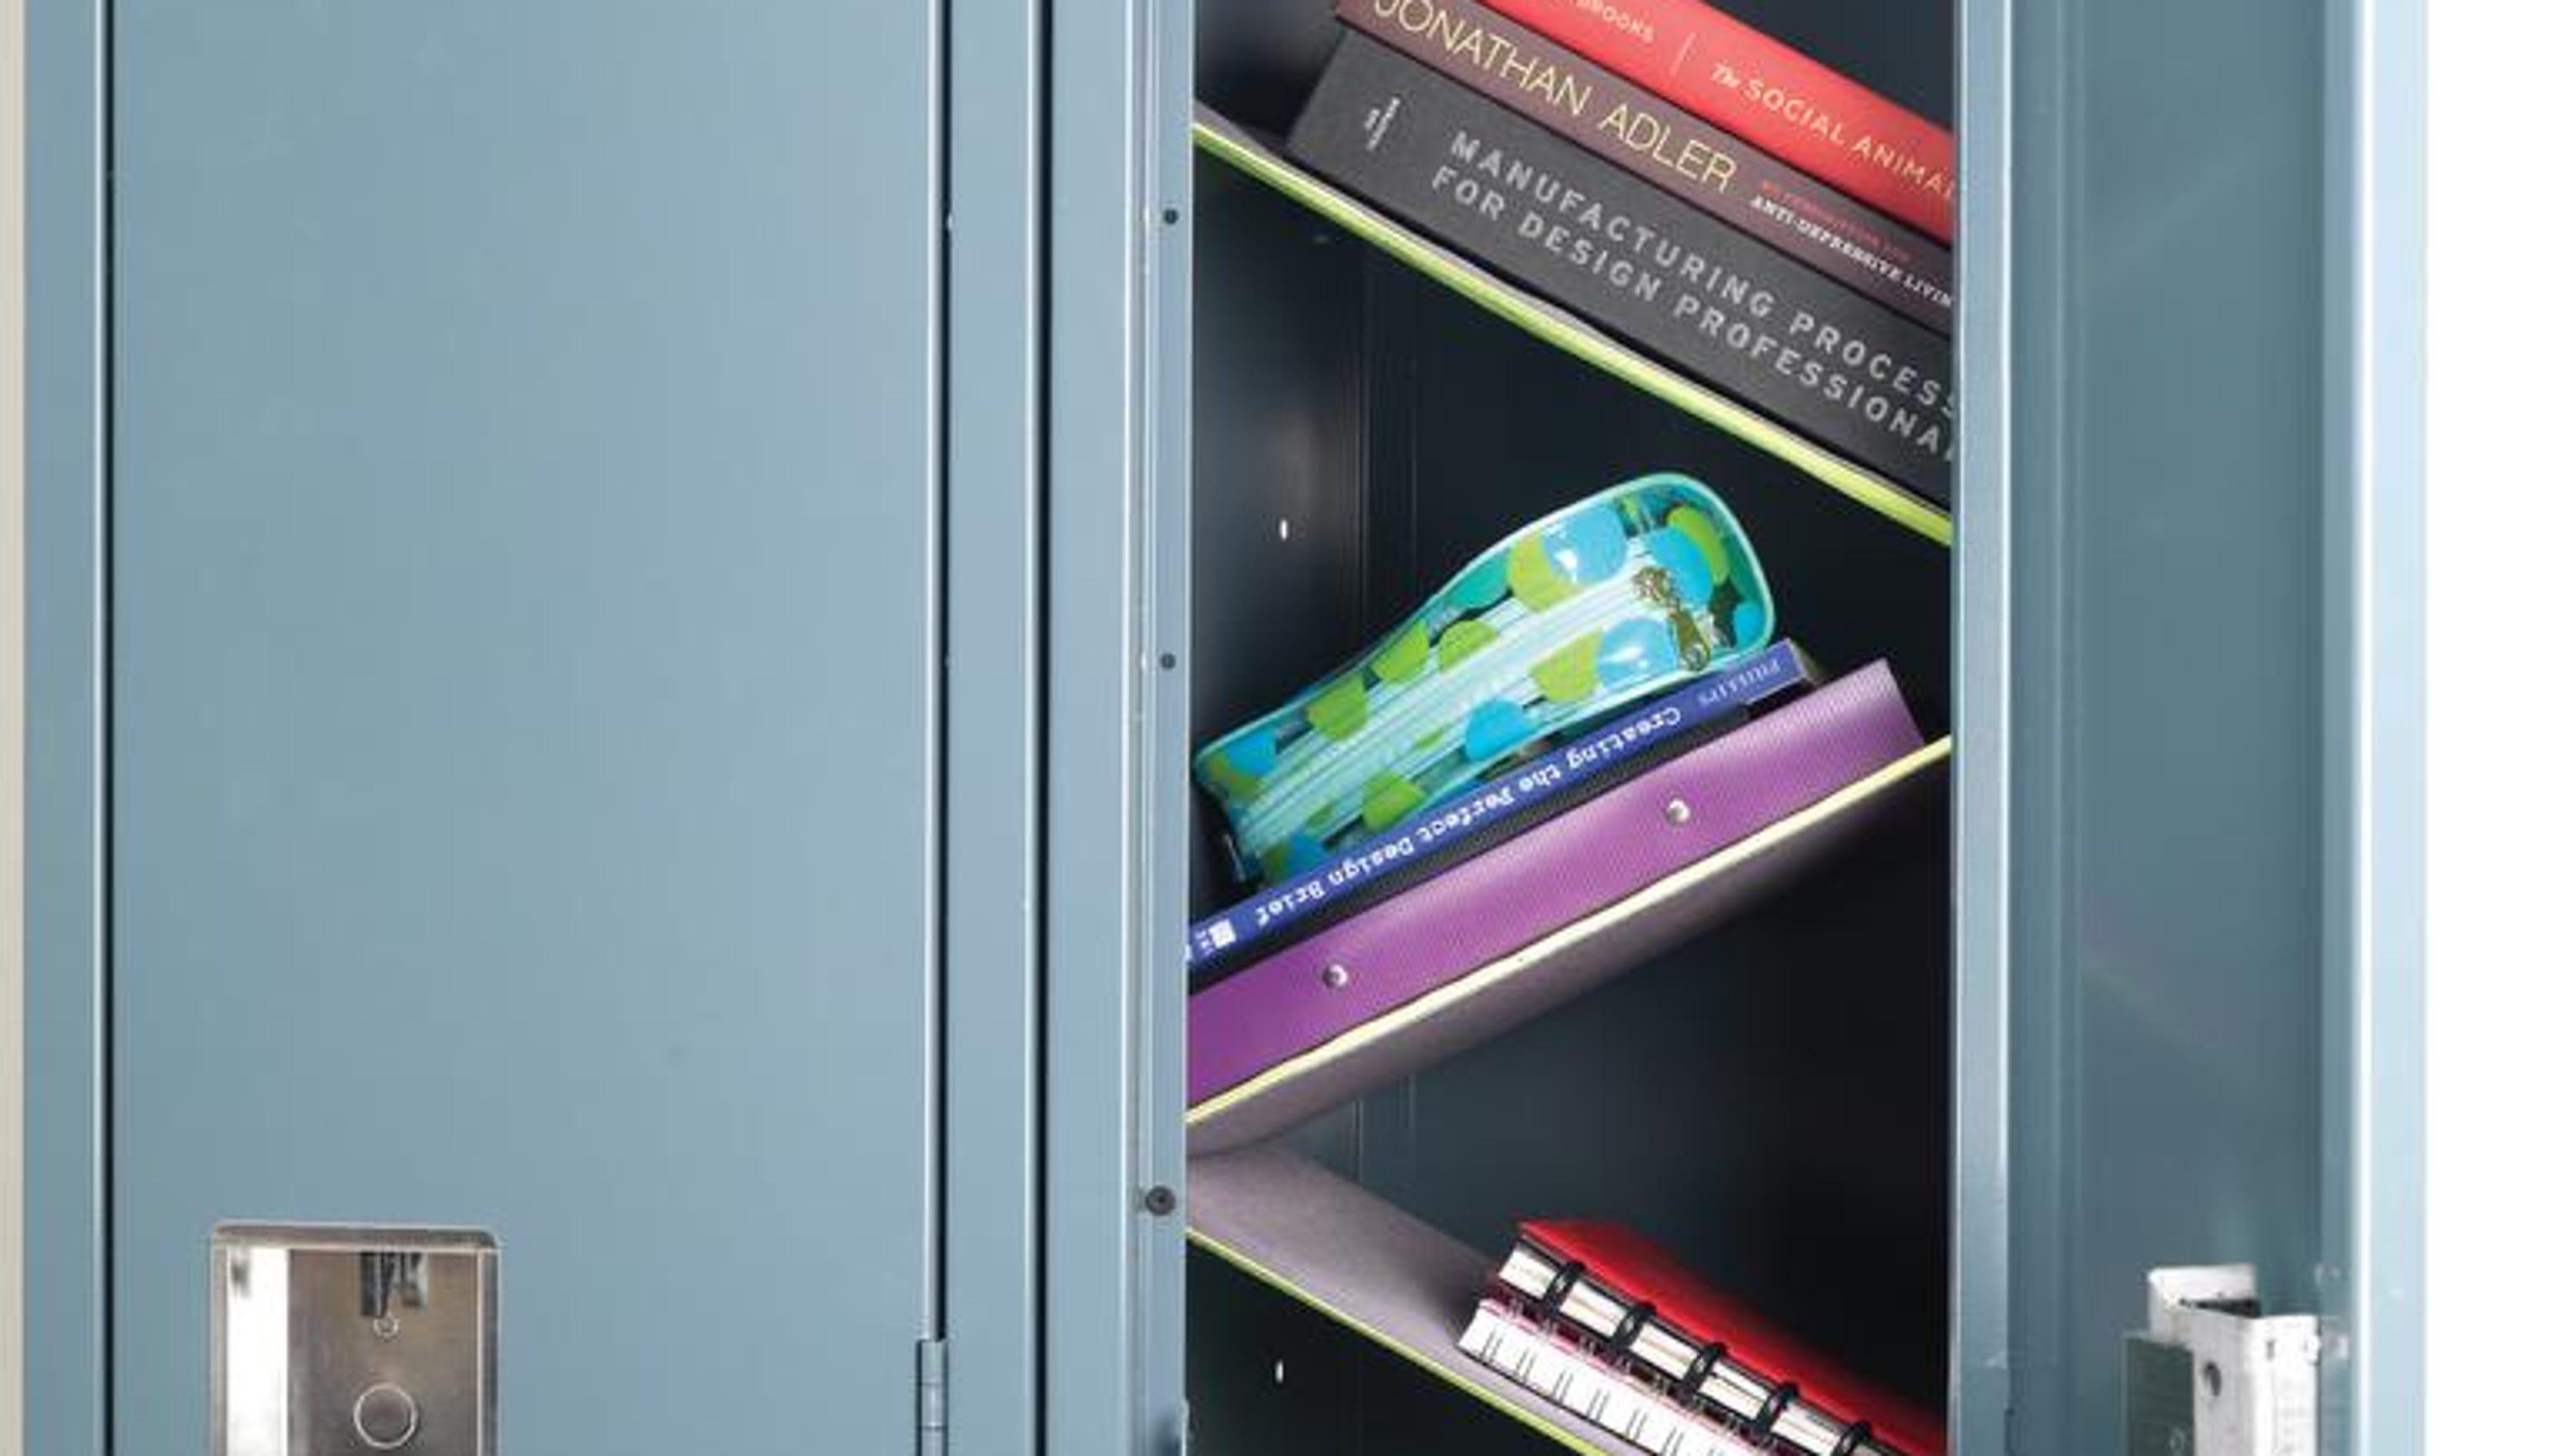 Back to school: Cool school supplies